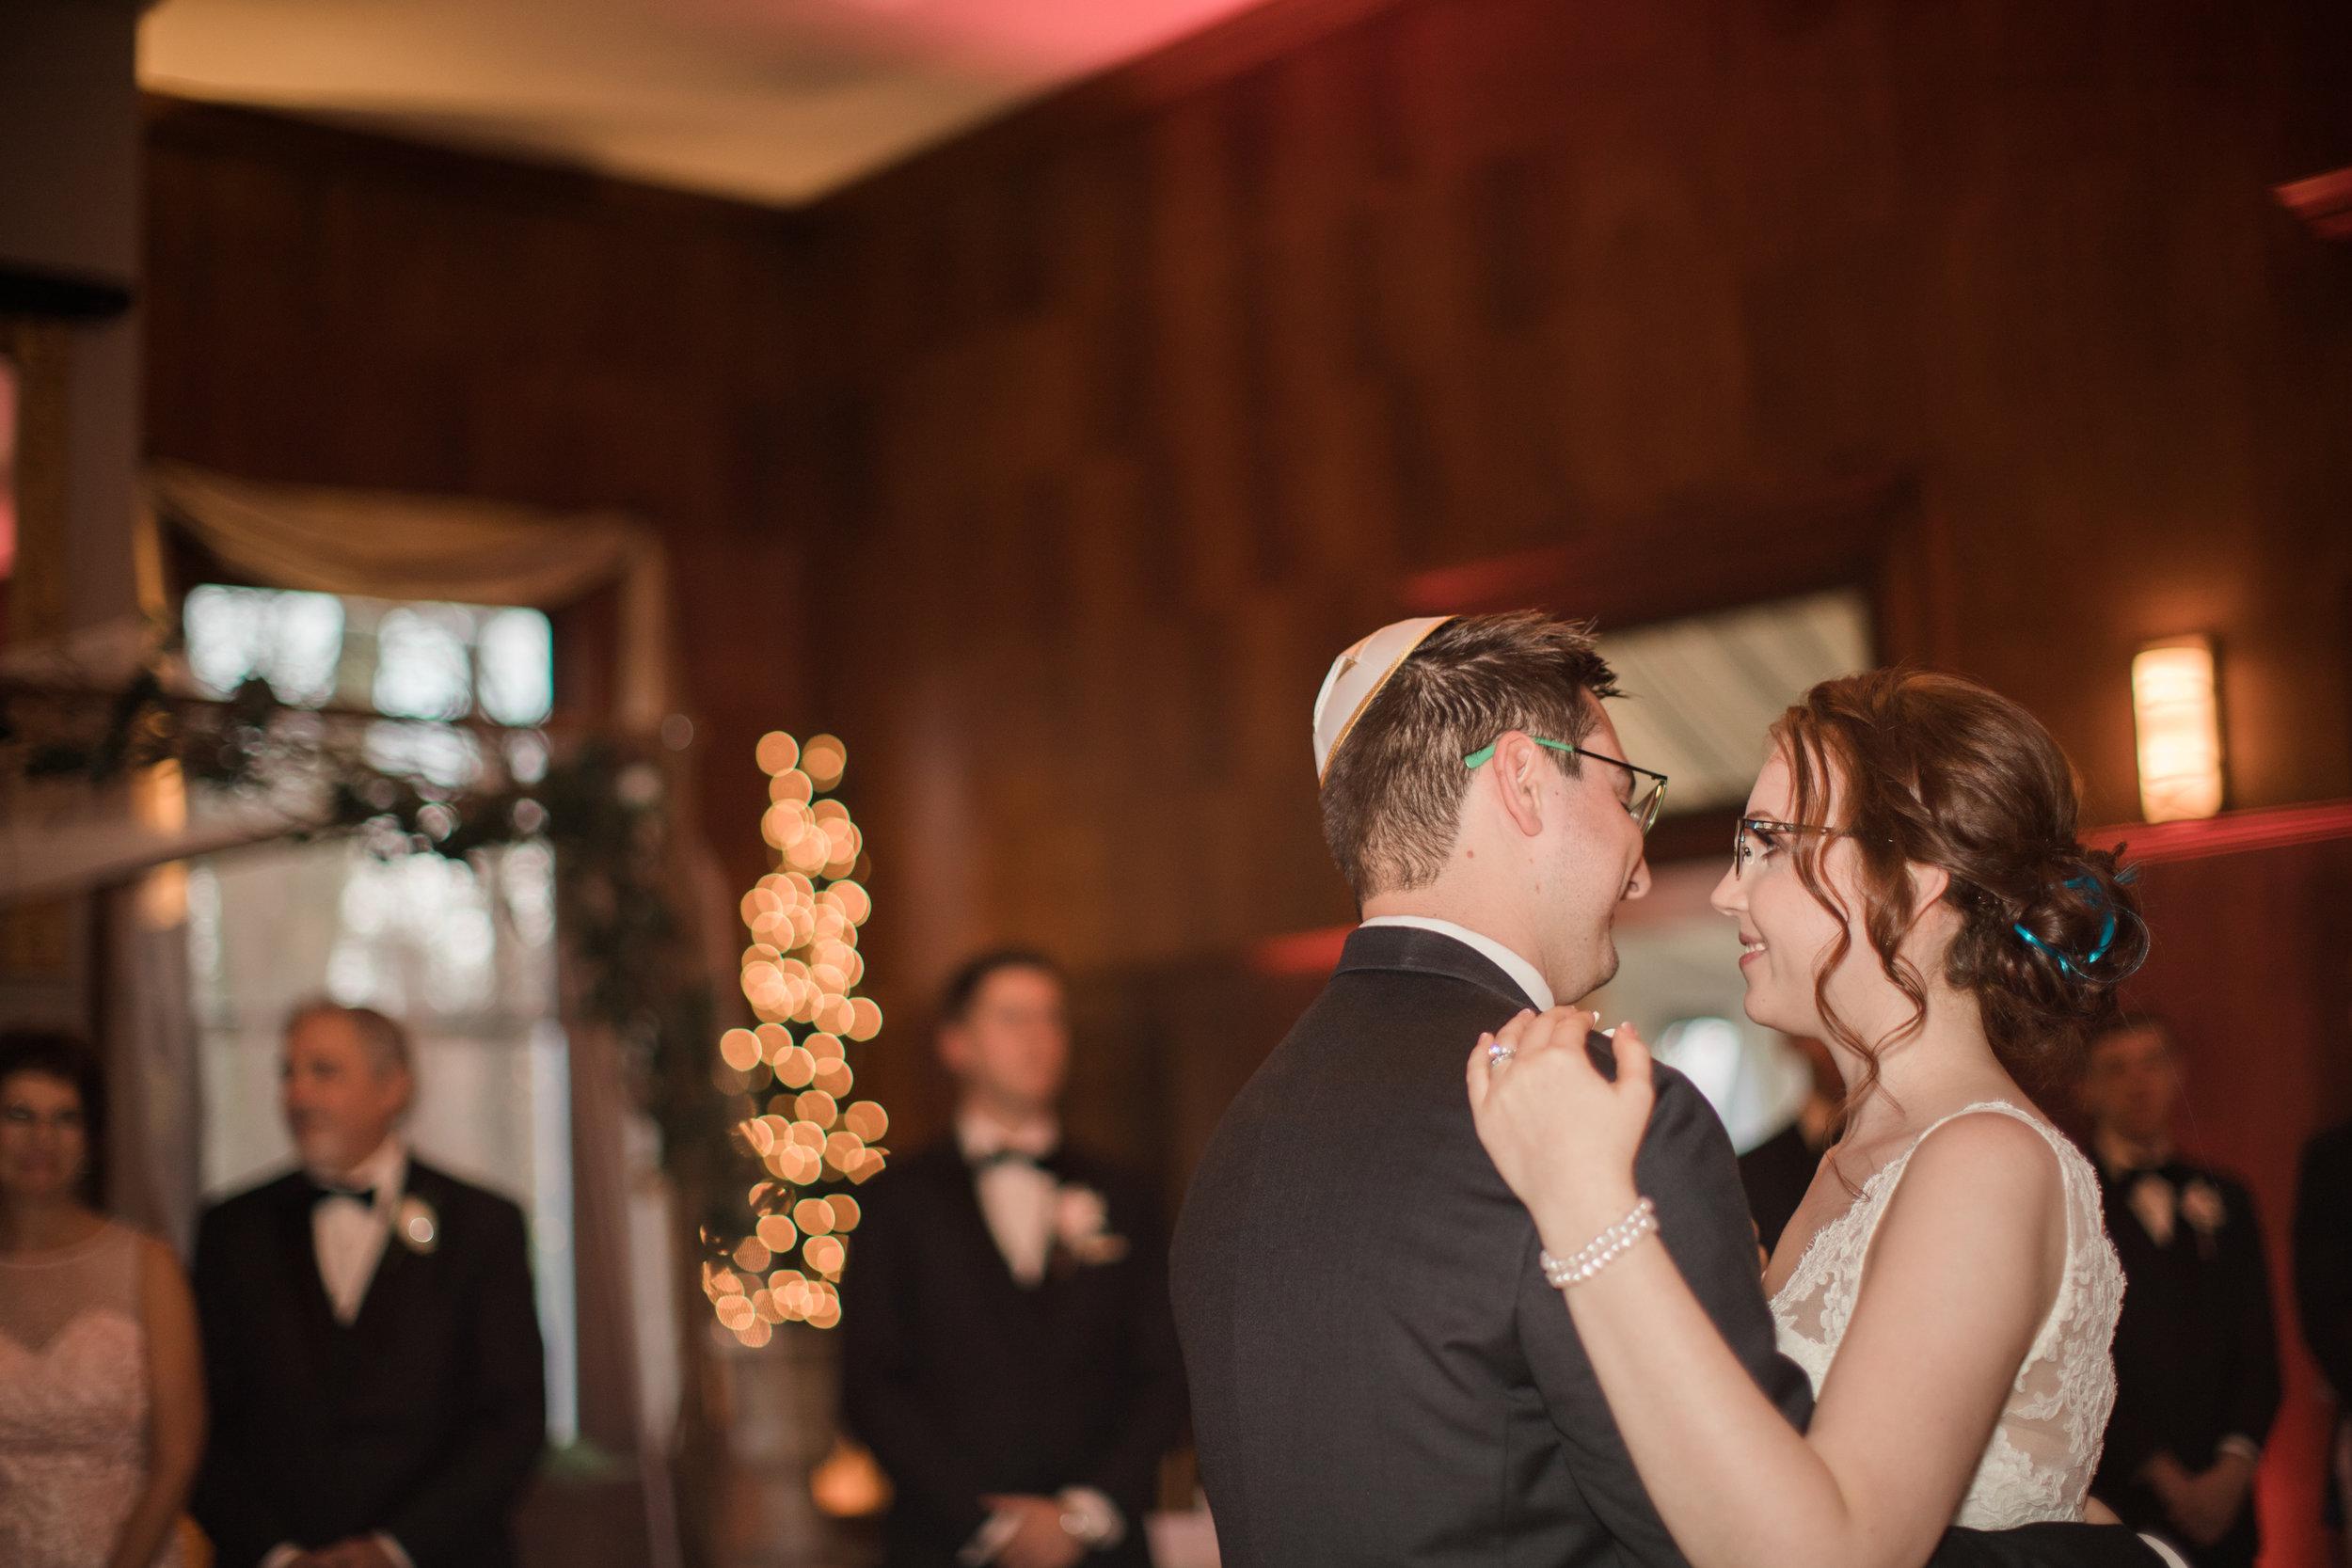 Harry Potter Wedding at Overhills Mansion Catonville Maryland Wedding Photographers Megapixels Media (96 of 134).jpg